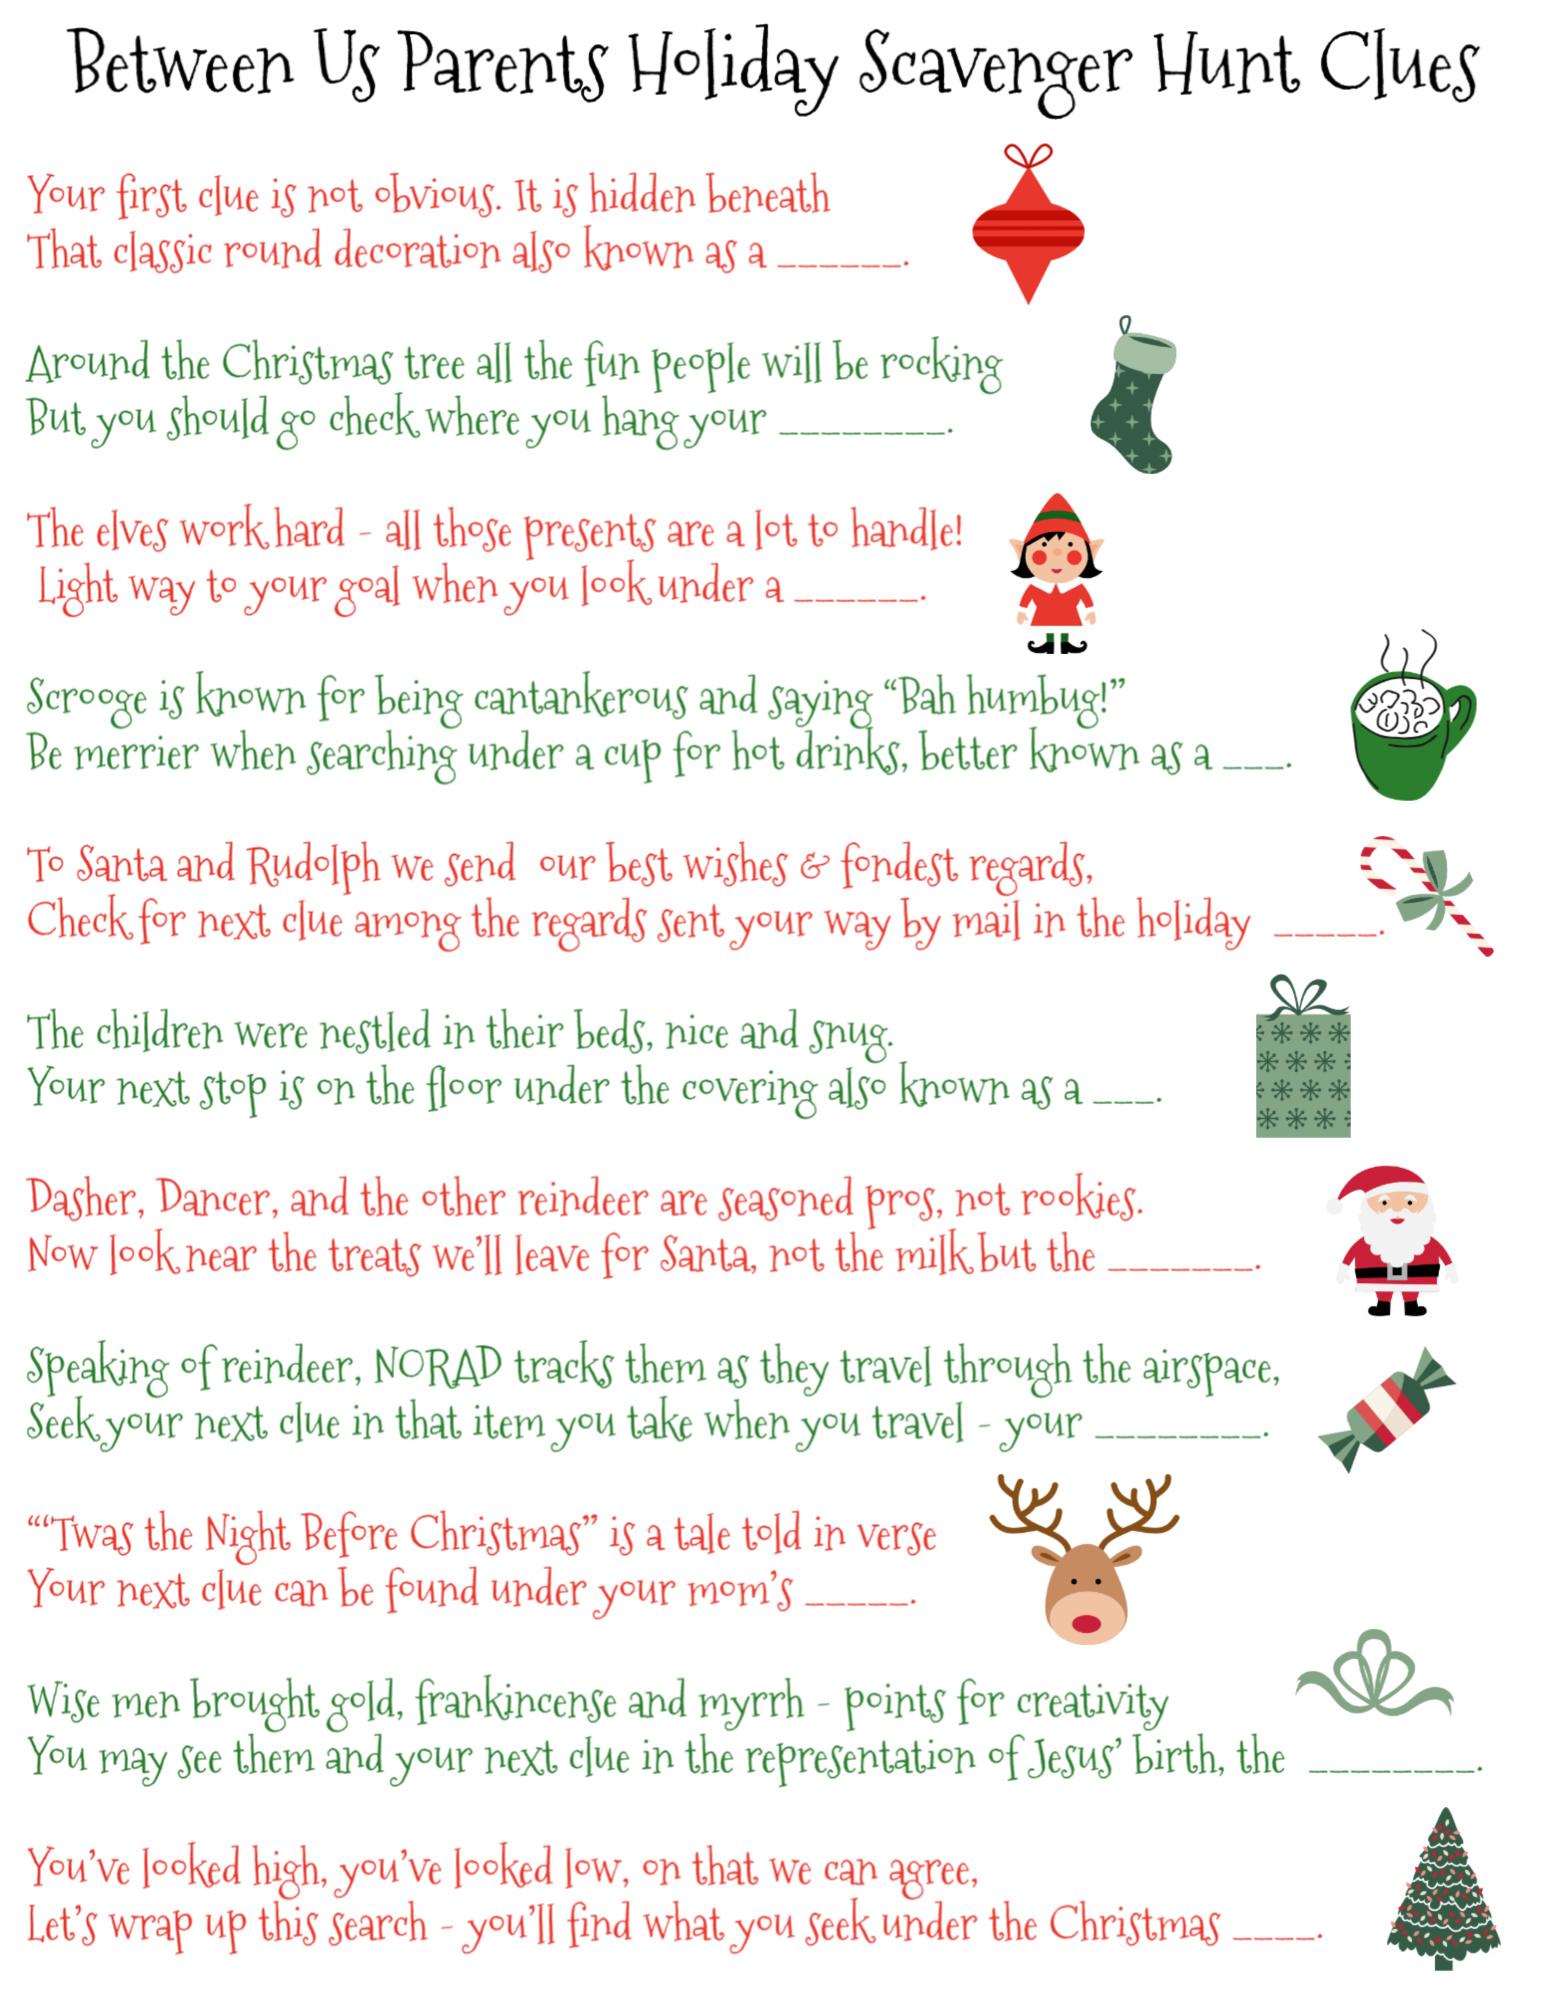 70 Printable Christmas Scavenger Hunt Clues Between Us Parents